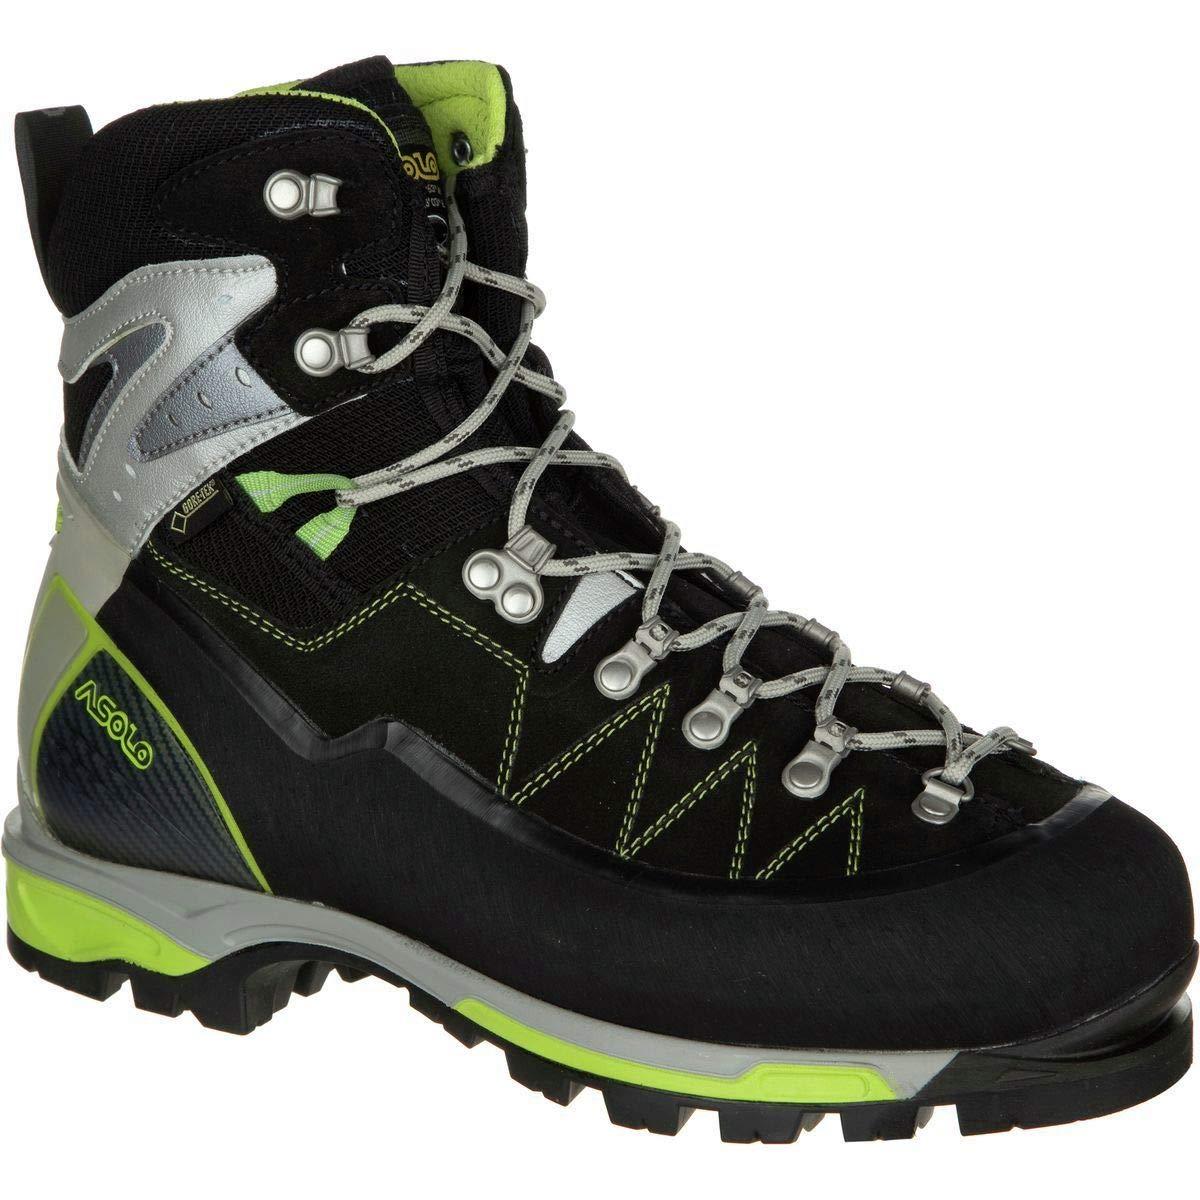 f8c9c3115c6 Asolo Alta Via GV Mountaineering Boot